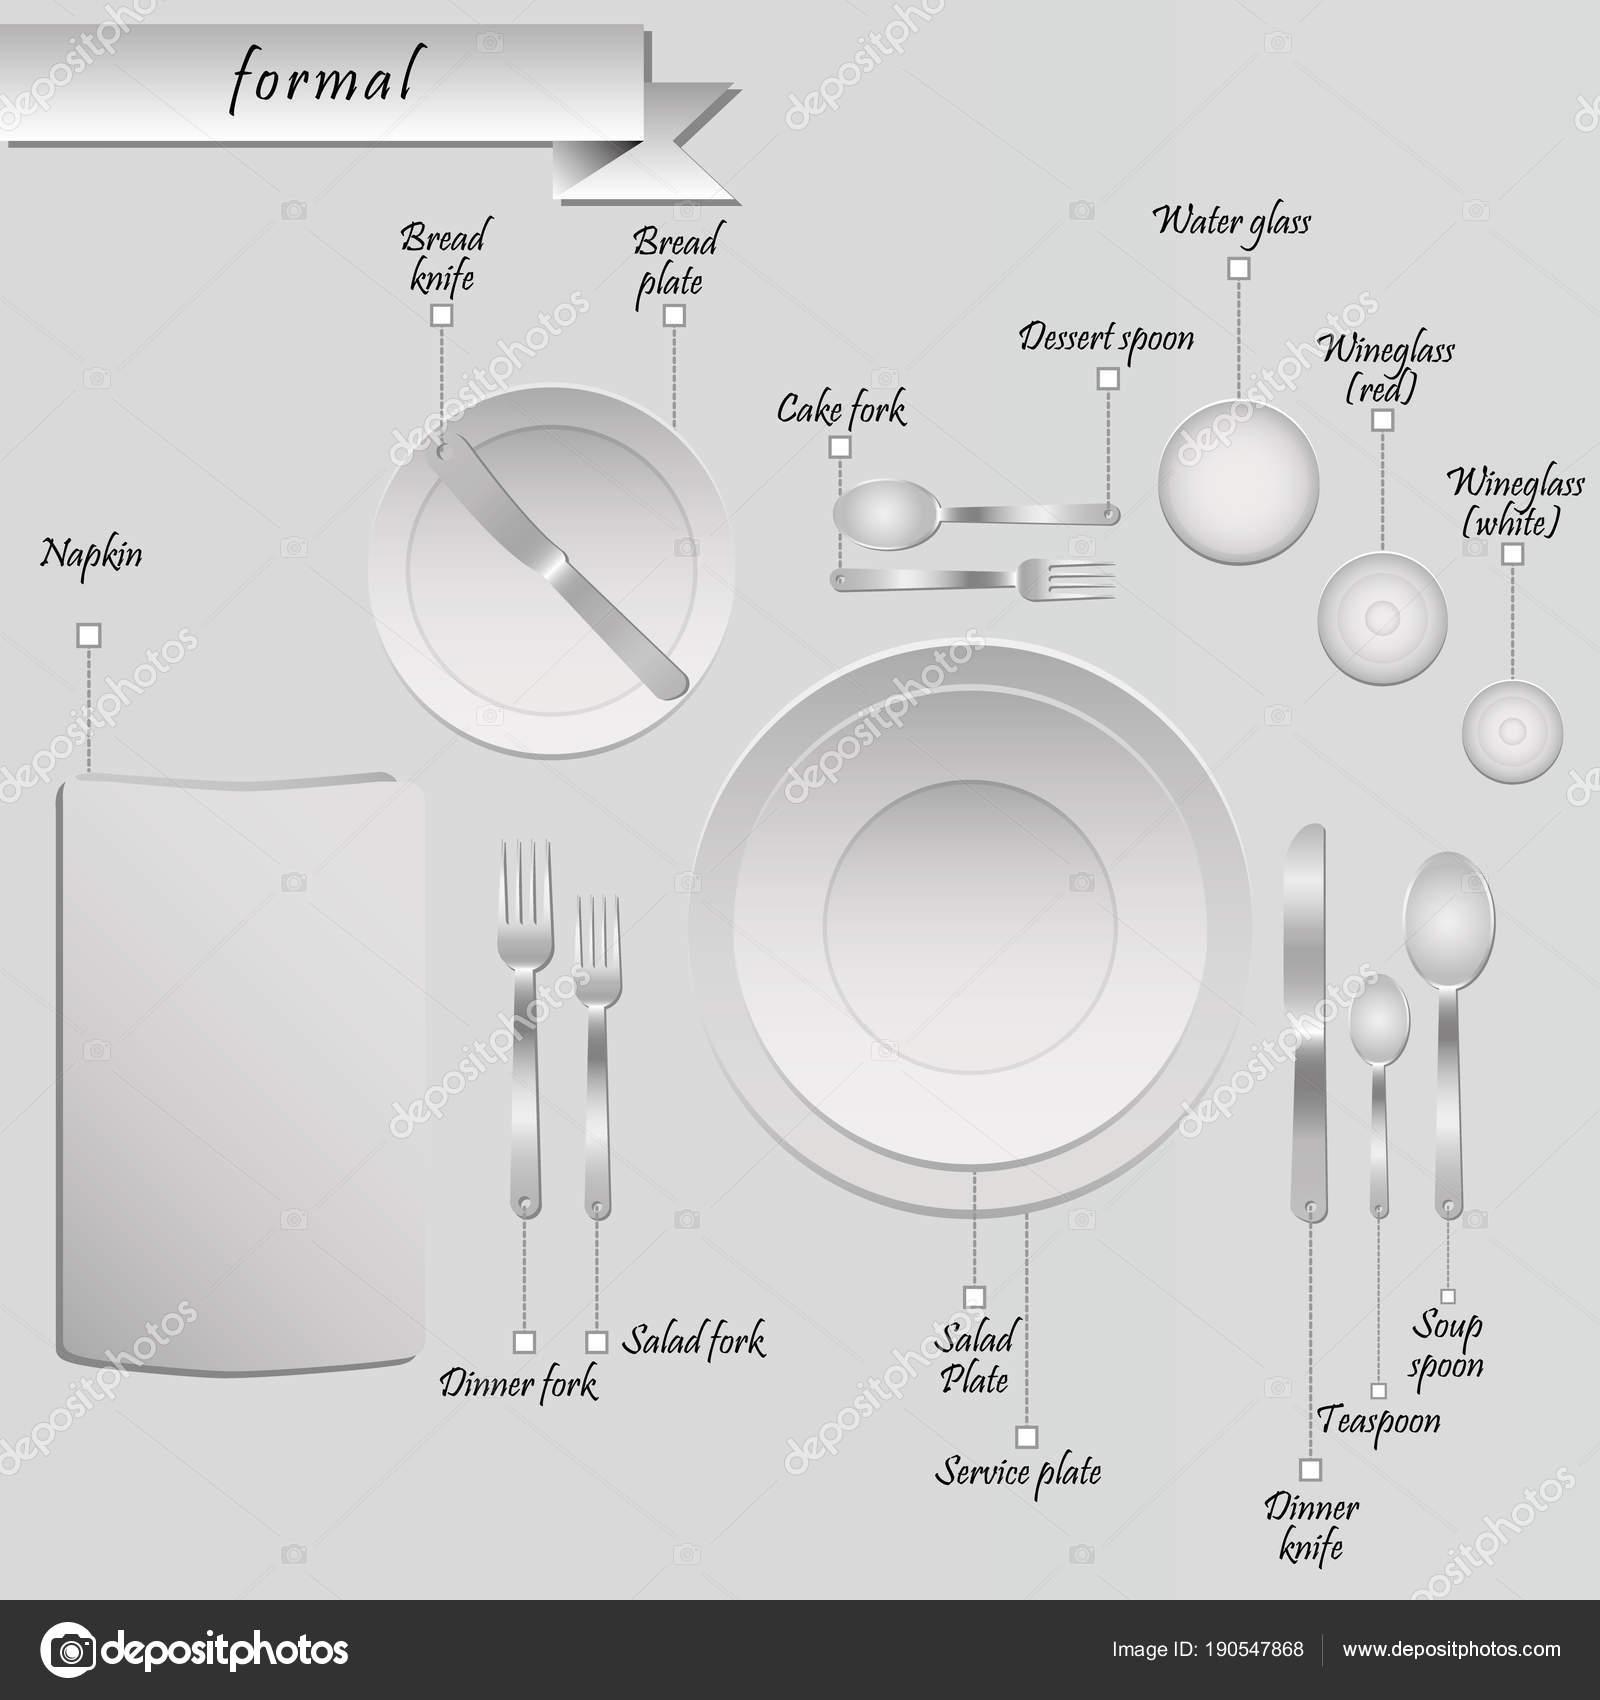 Plan Cutlery Table Grey Background Formal Table Setting u2014 Stock Vector  sc 1 st  Depositphotos & Plan Cutlery Table Grey Background Formal Table Setting u2014 Stock ...